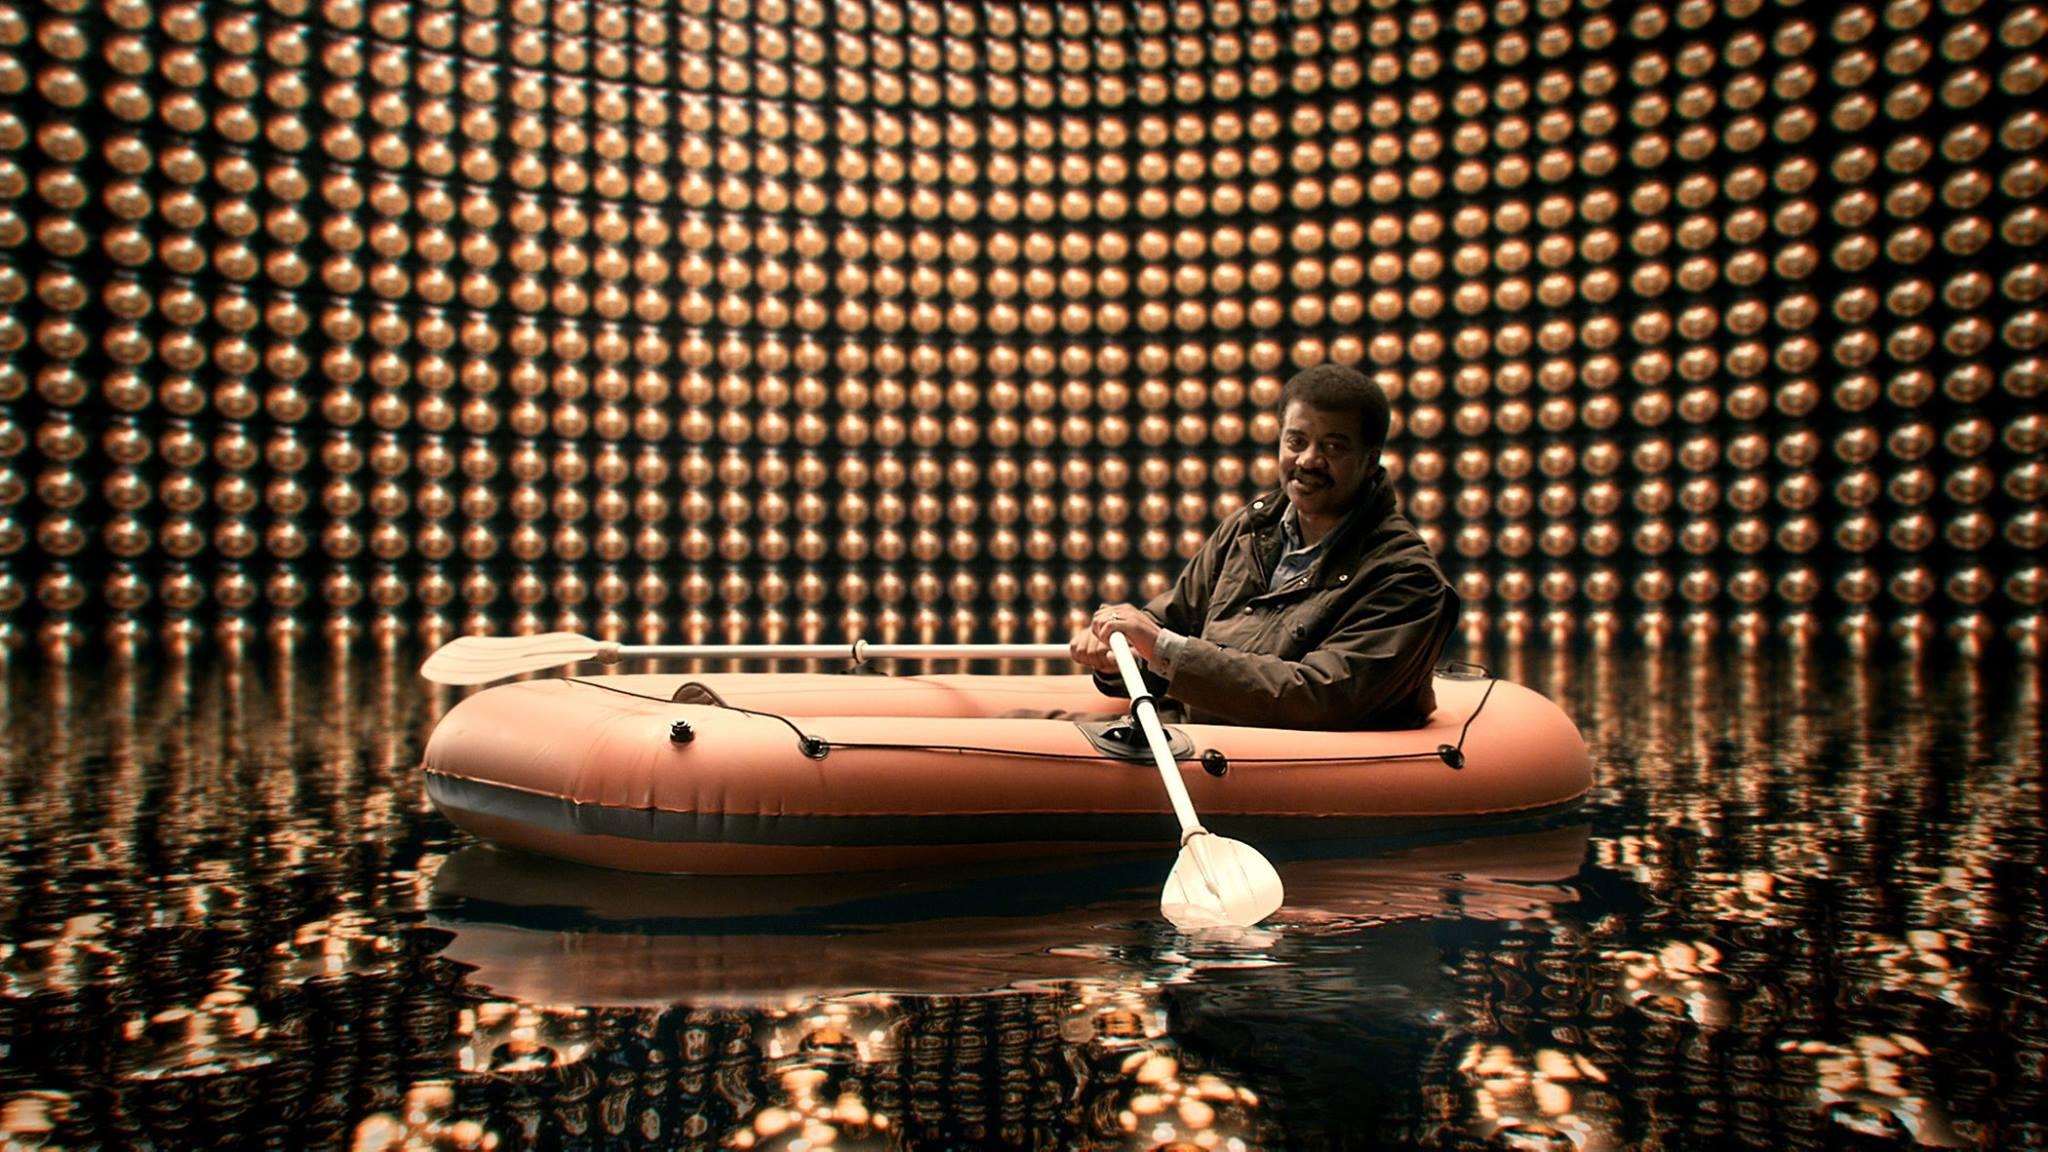 Neutrino mass Alberto Lesarri GEPCS UVa 2048x1152